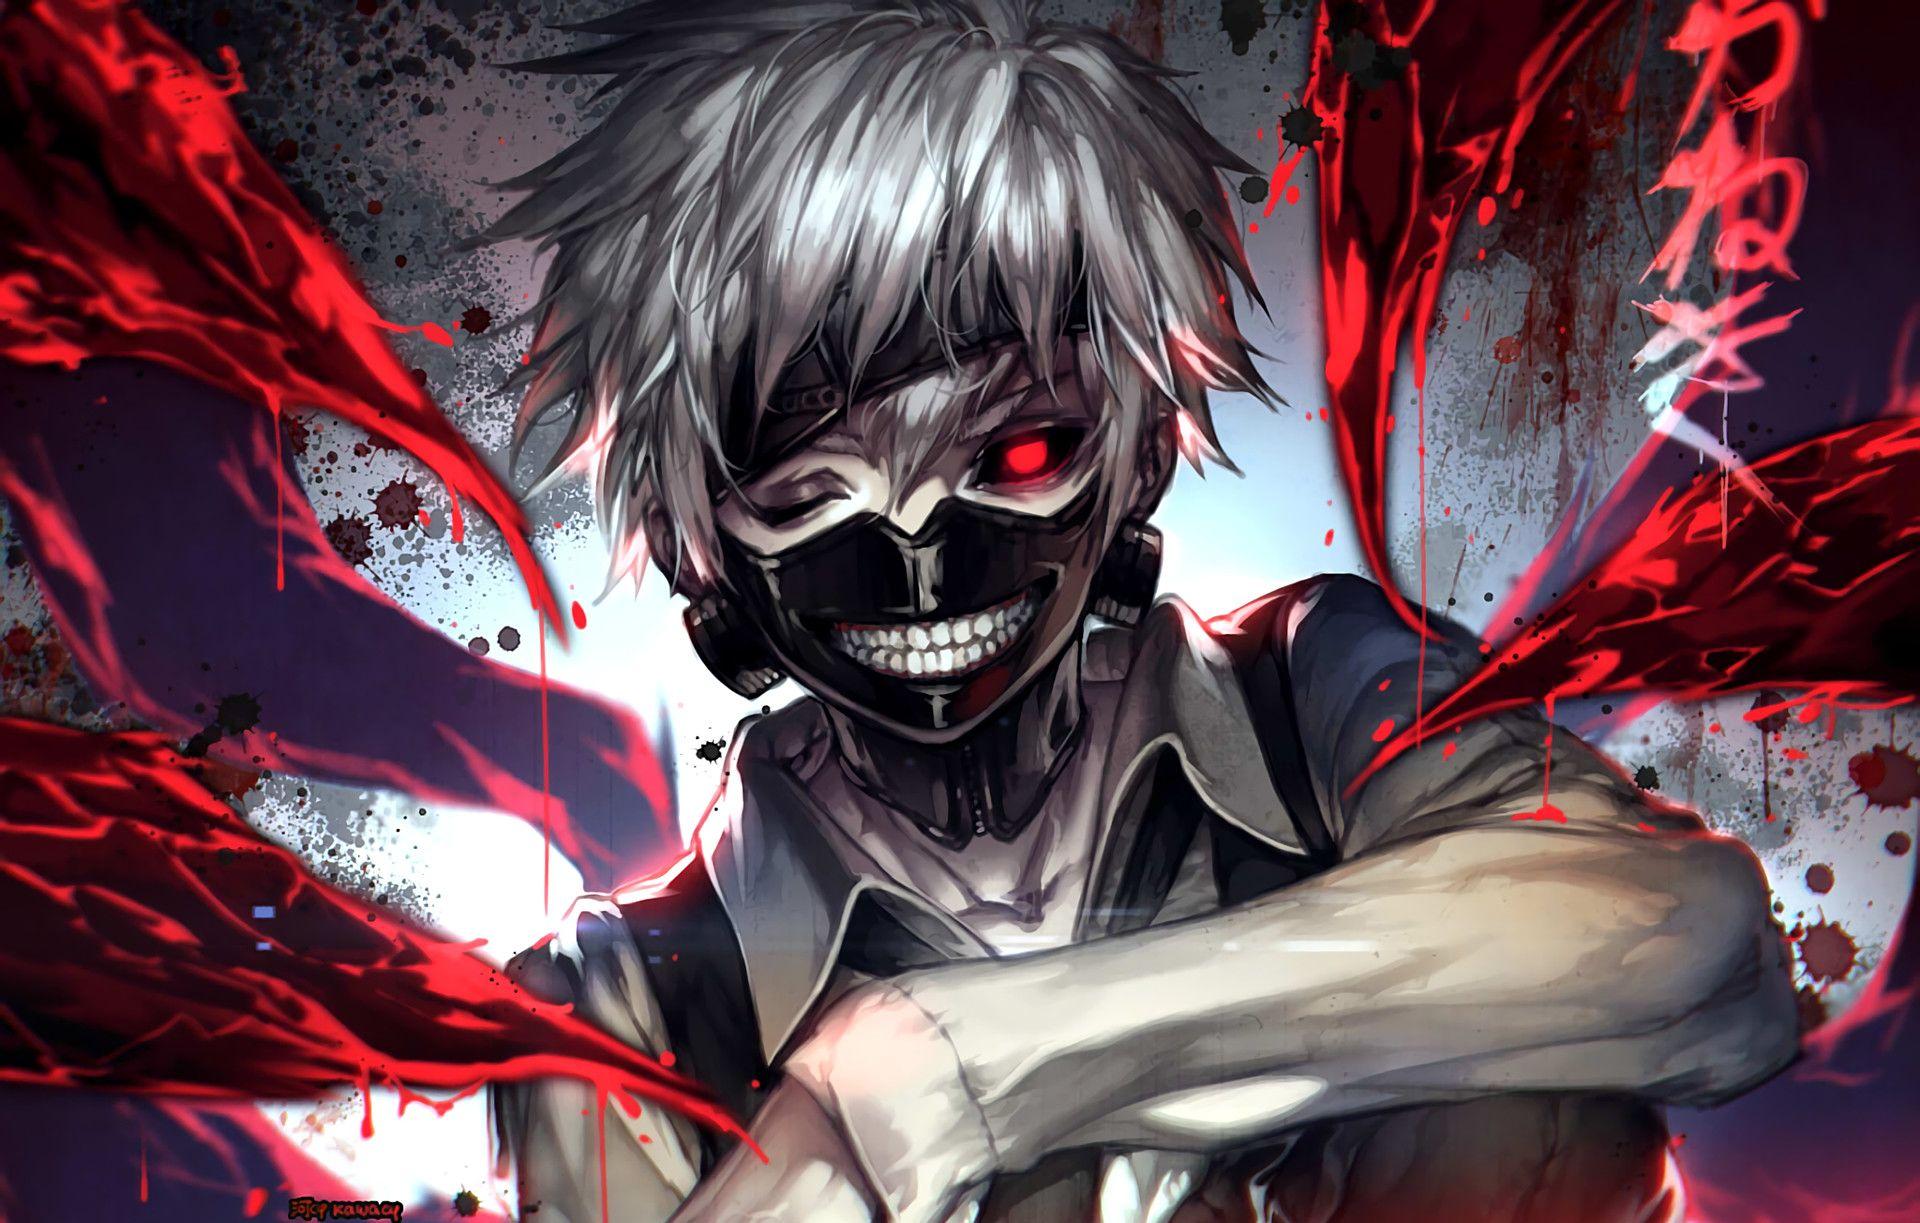 900+ Top Anime Wallpaper Ideas | Anime Wallpaper, Anime, Hd Anime Wallpapers